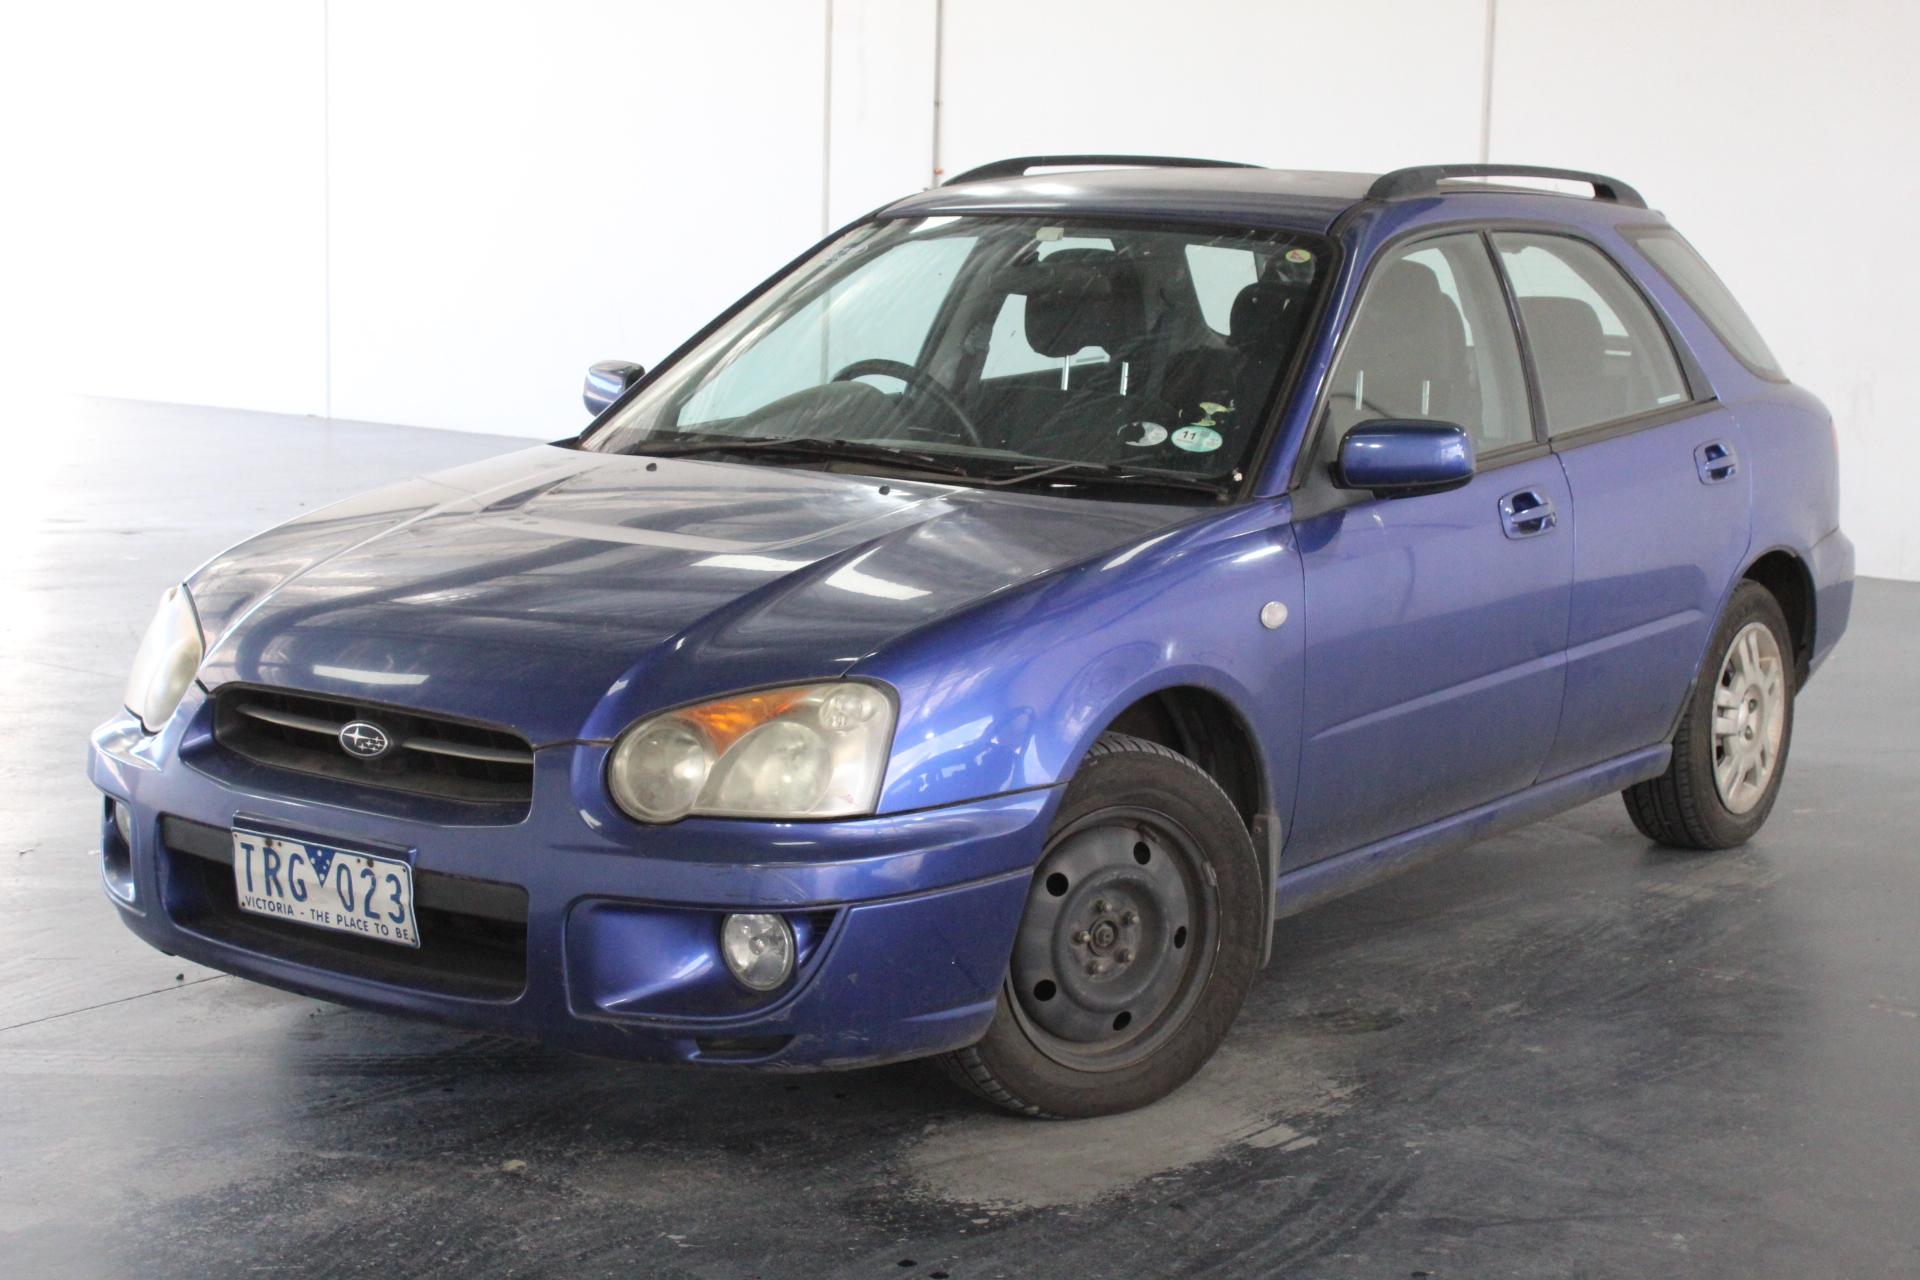 2004 Subaru Impreza GX (AWD) G2 Manual Hatchback